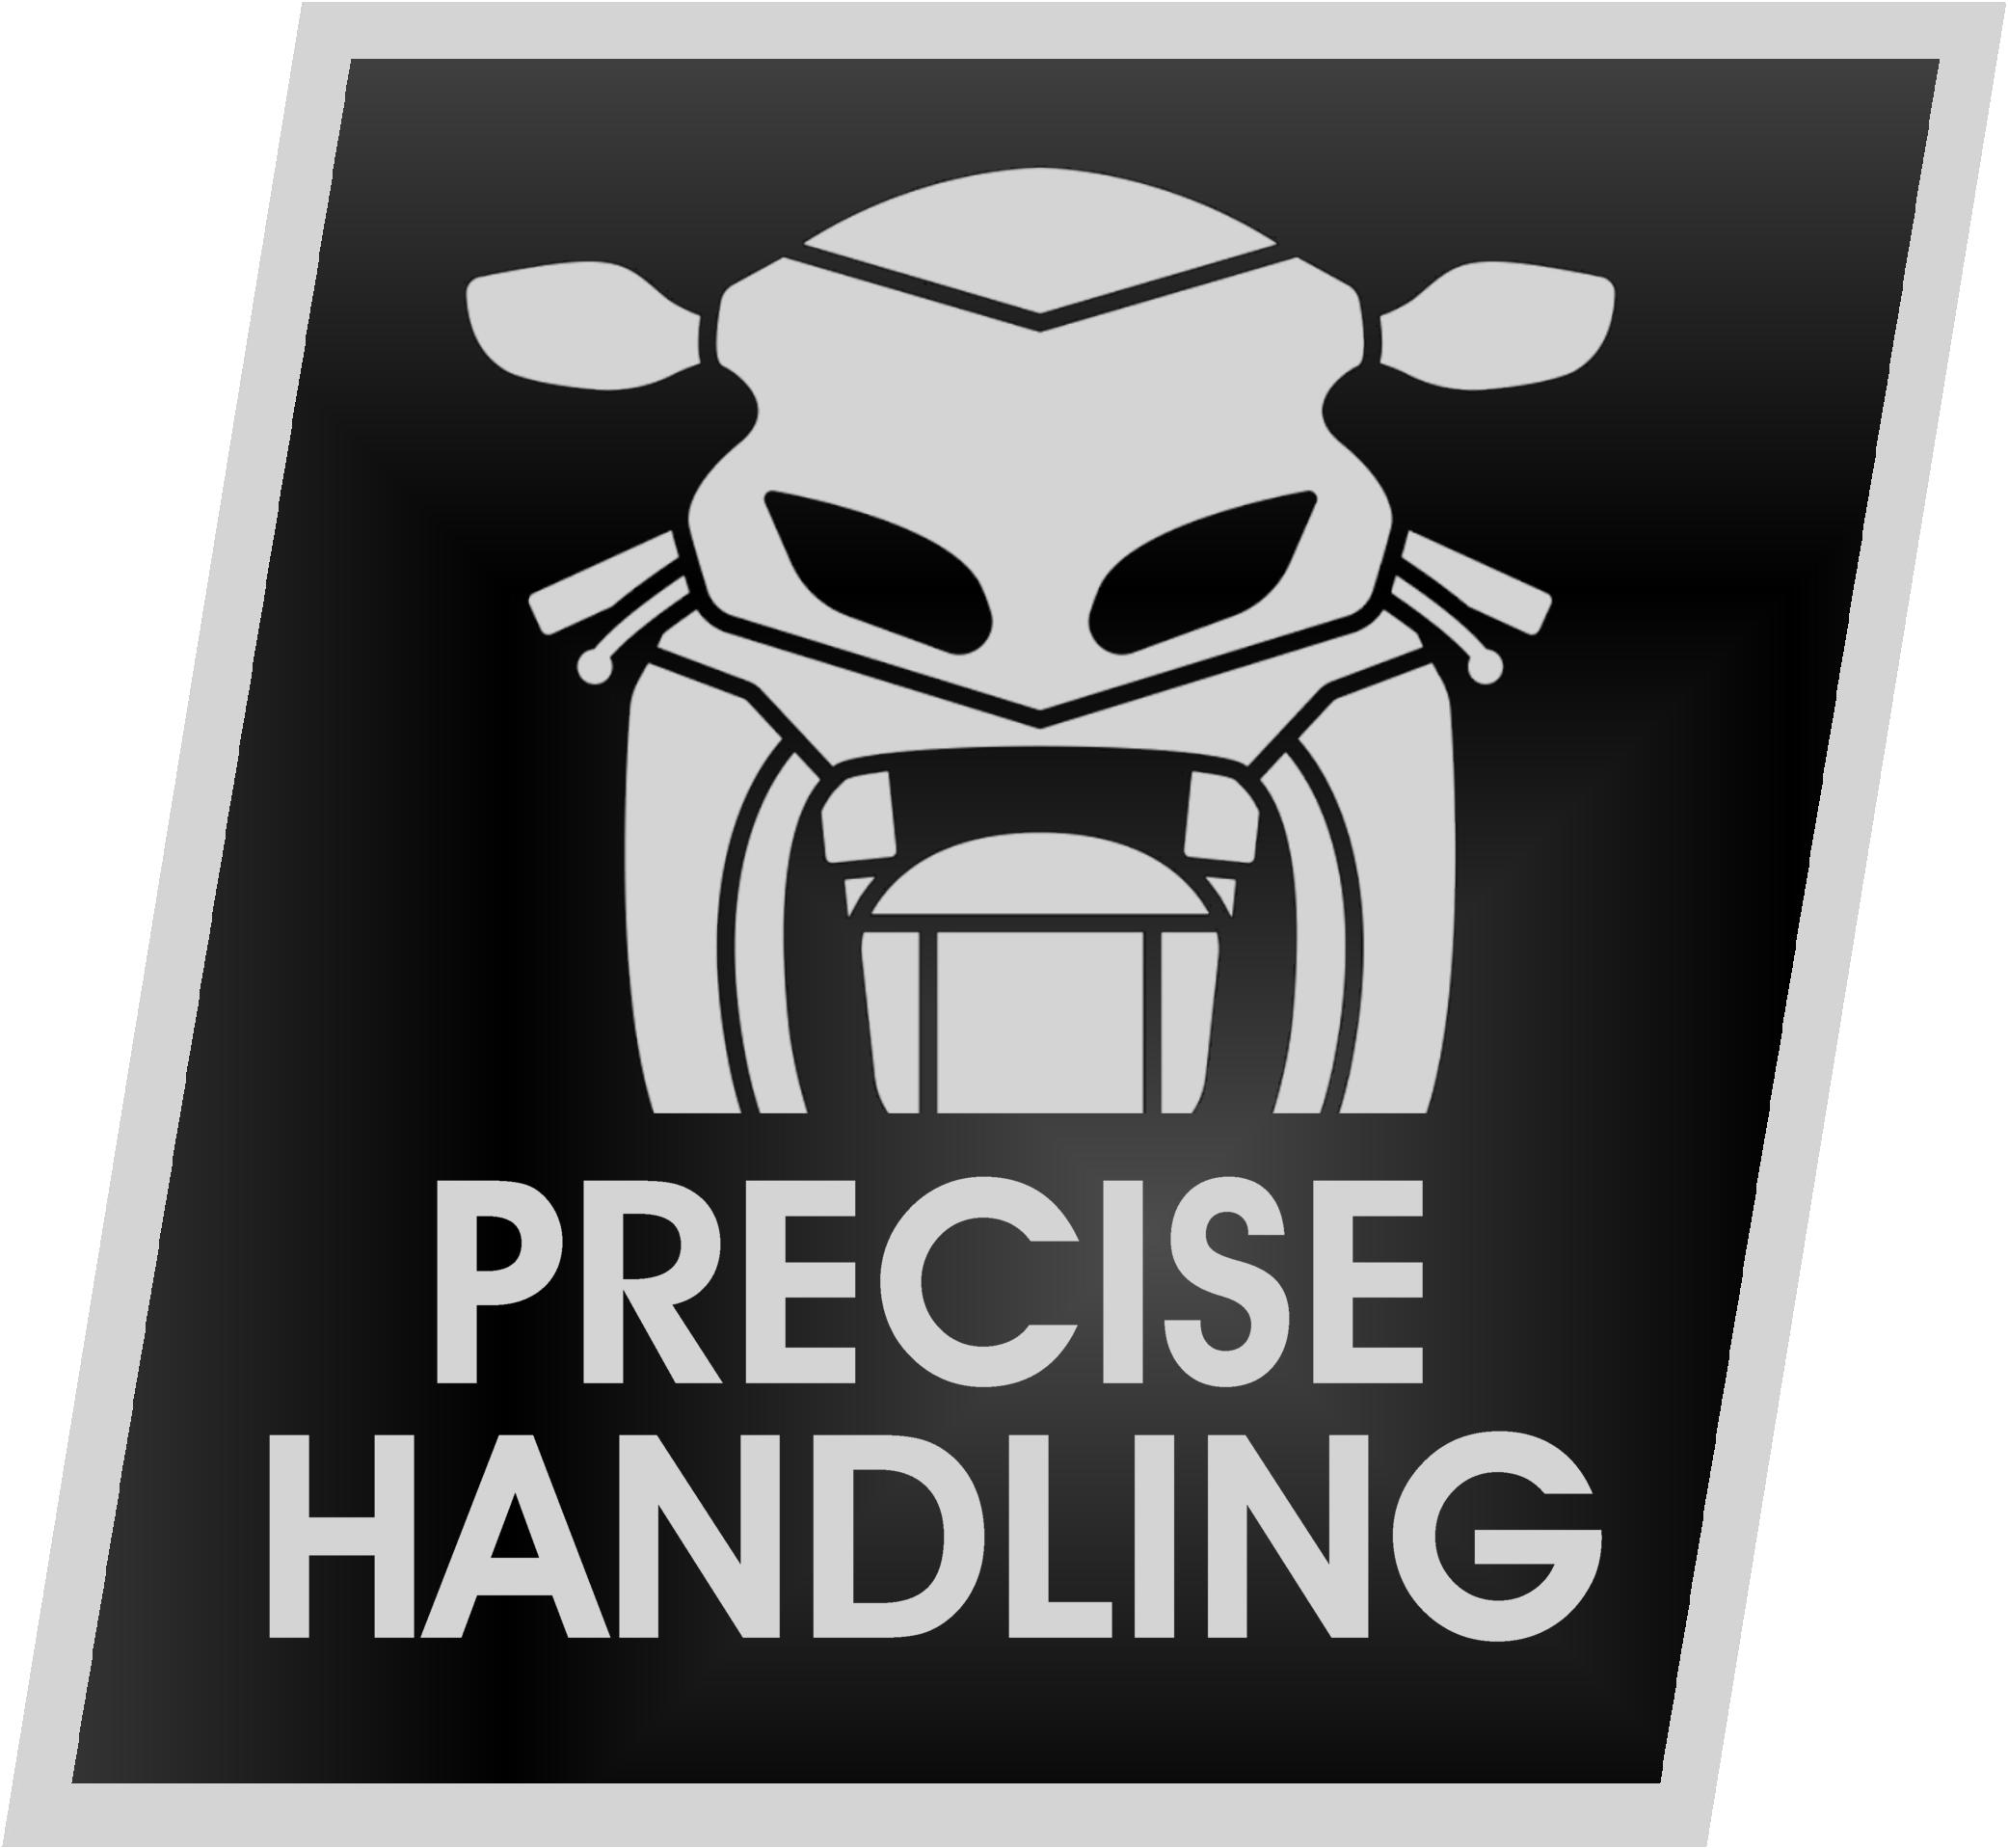 PRECISE HANDLING